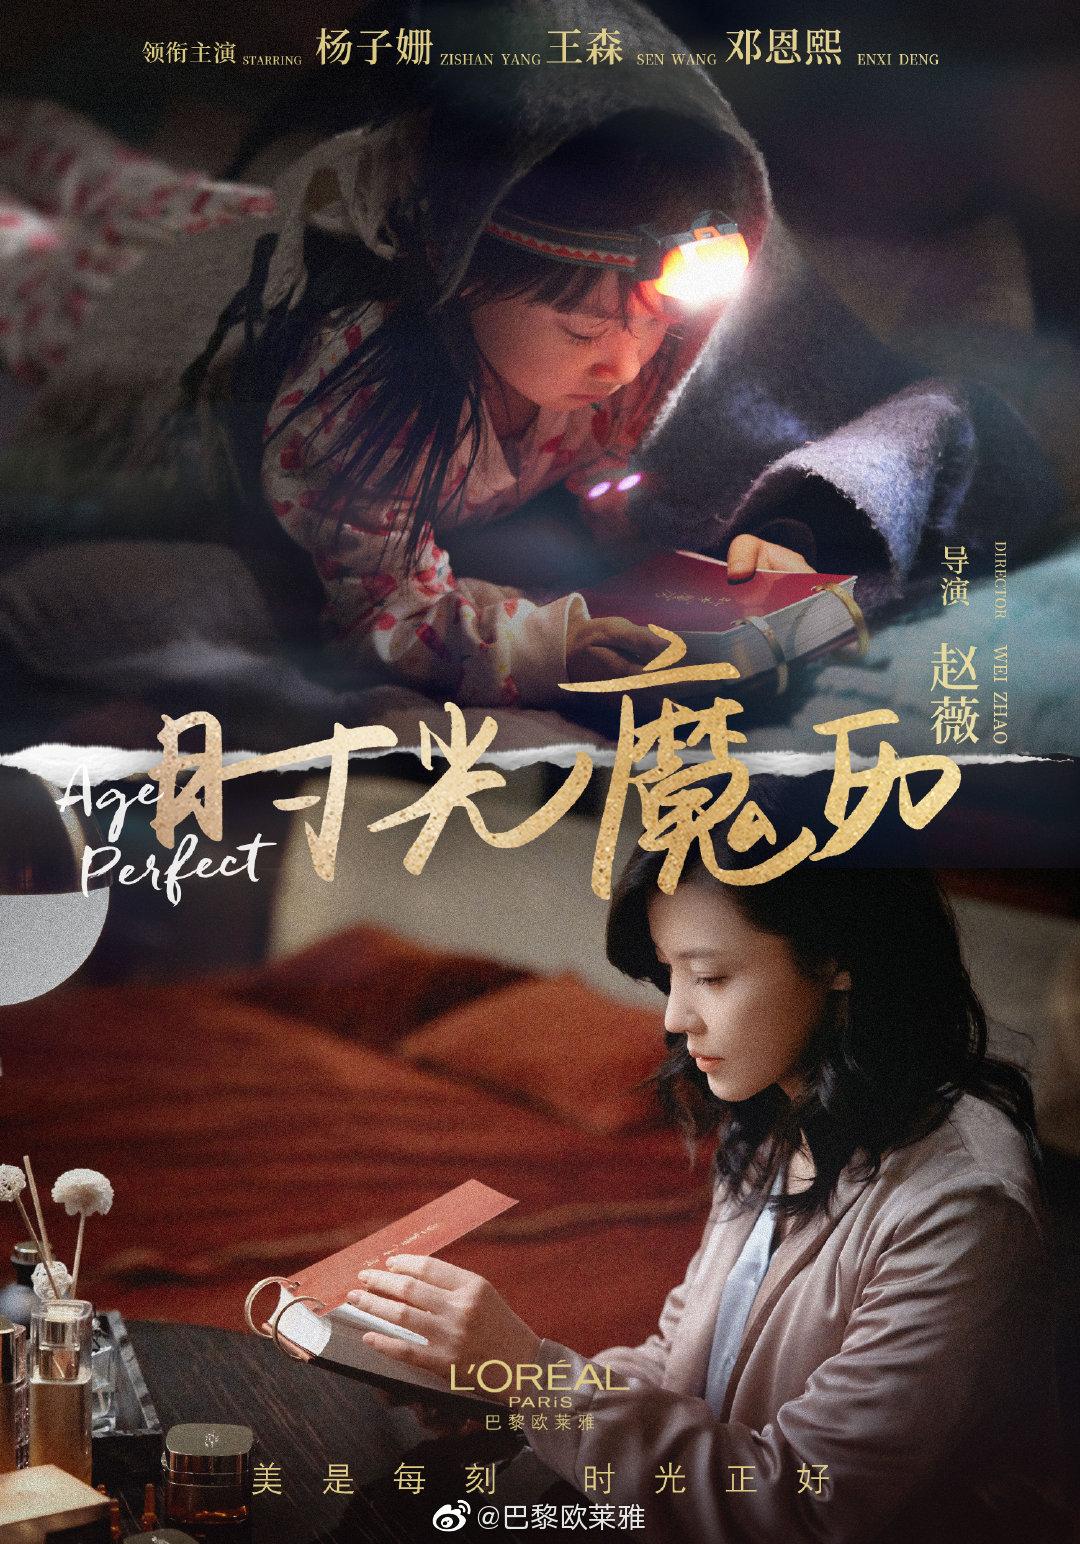 Phim ngắn: MA LỰC THỜI GIAN | 时光魔历 (VietSub)